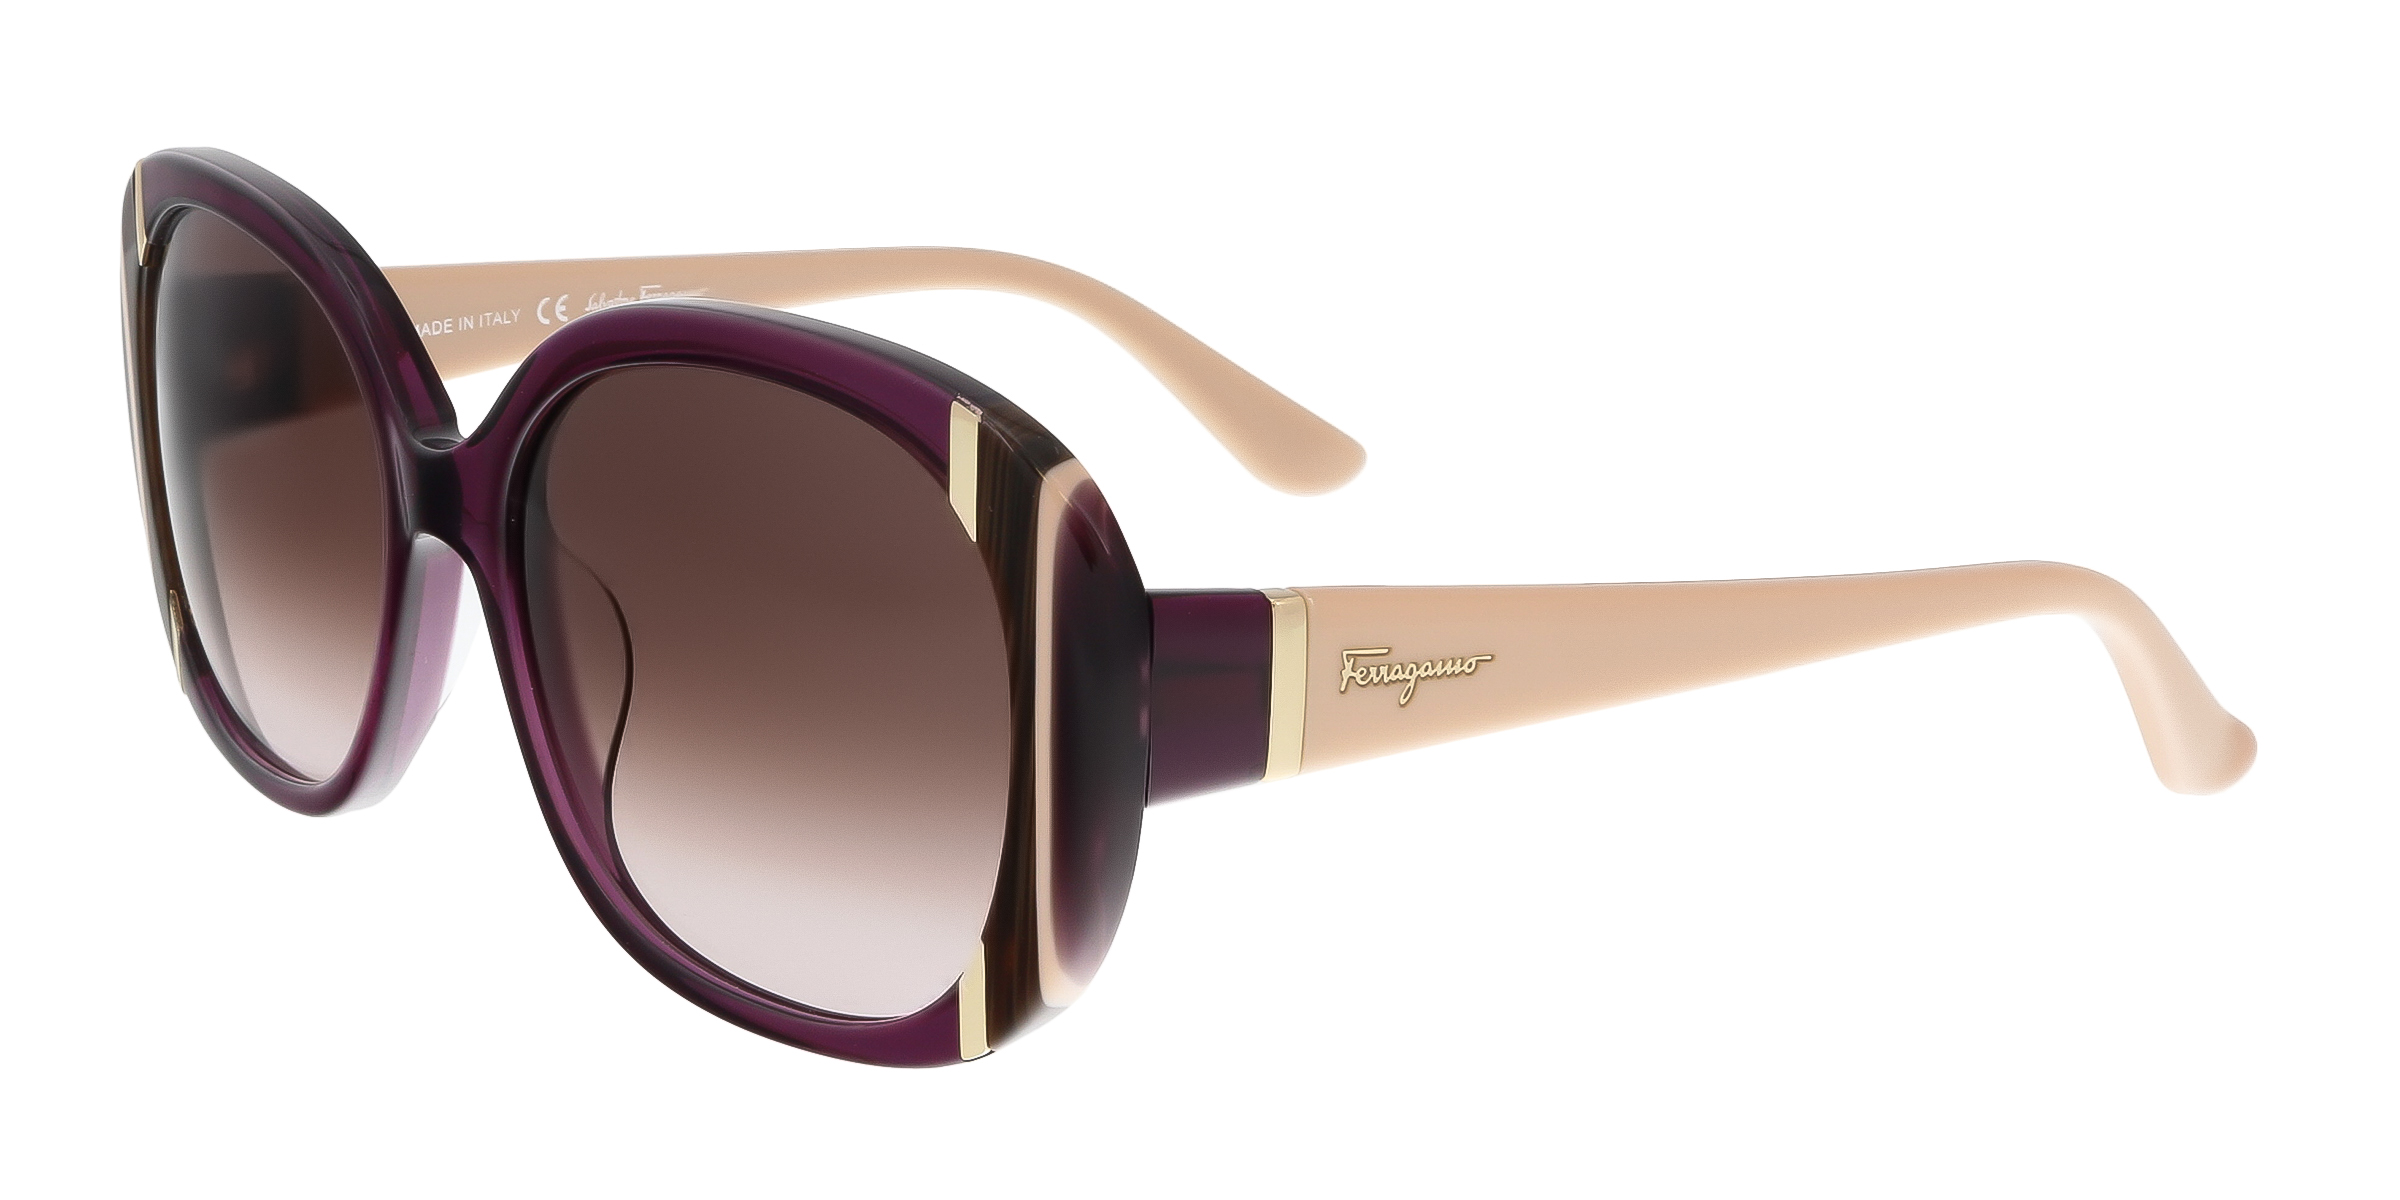 Salvatore Ferragamo SF674/S 500 Shiny Violet Oval Feline Sunglasses